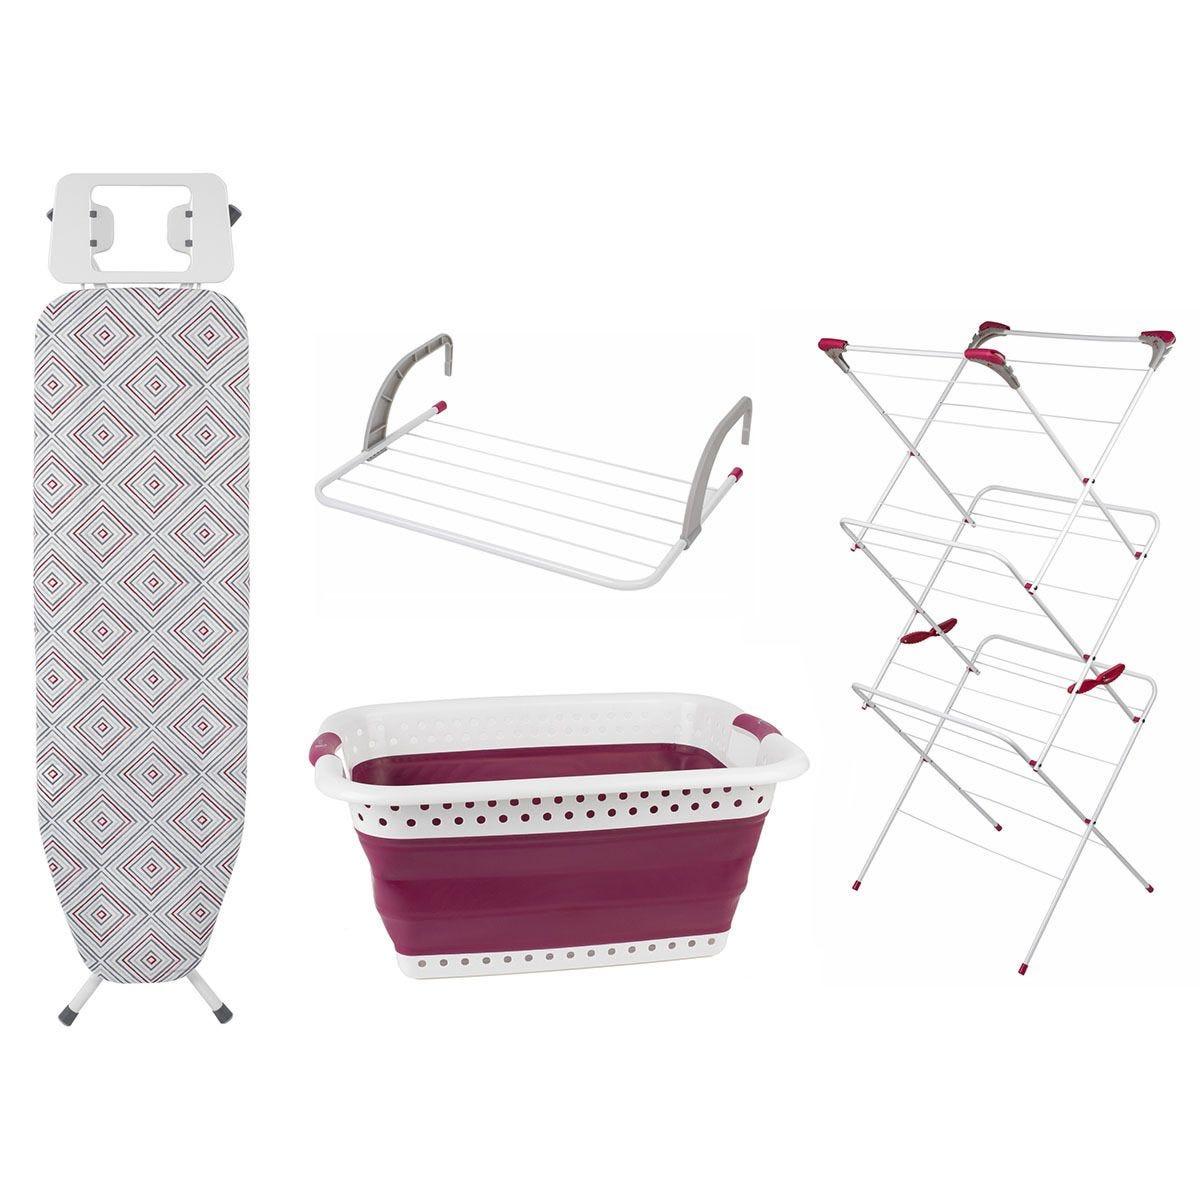 Kleeneze 4 Piece Laundry Set - Diamond